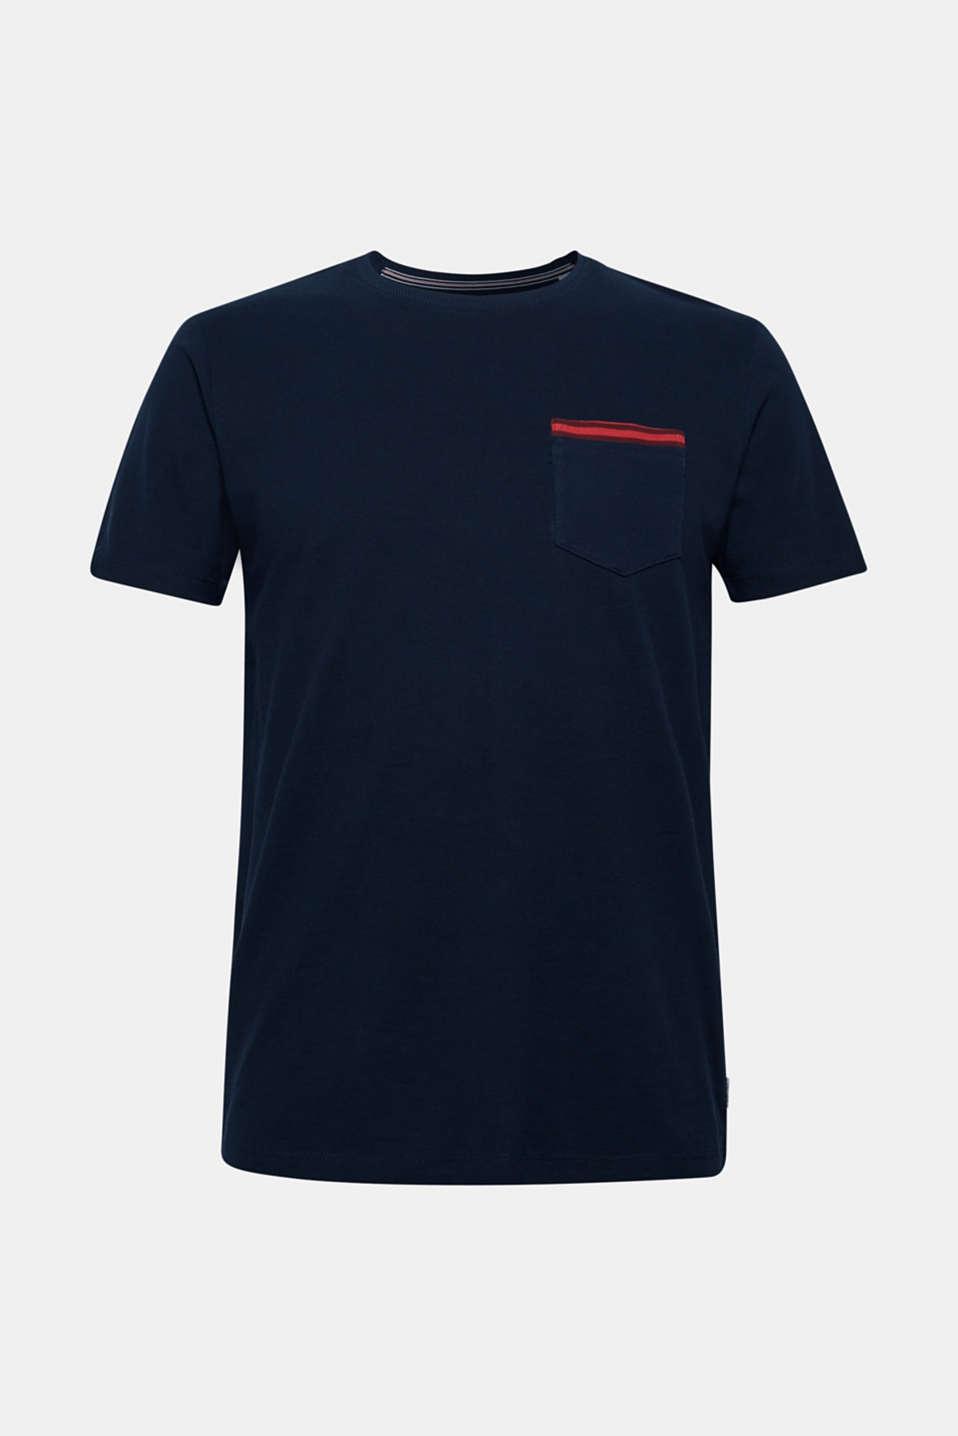 T-Shirts, NAVY, detail image number 8